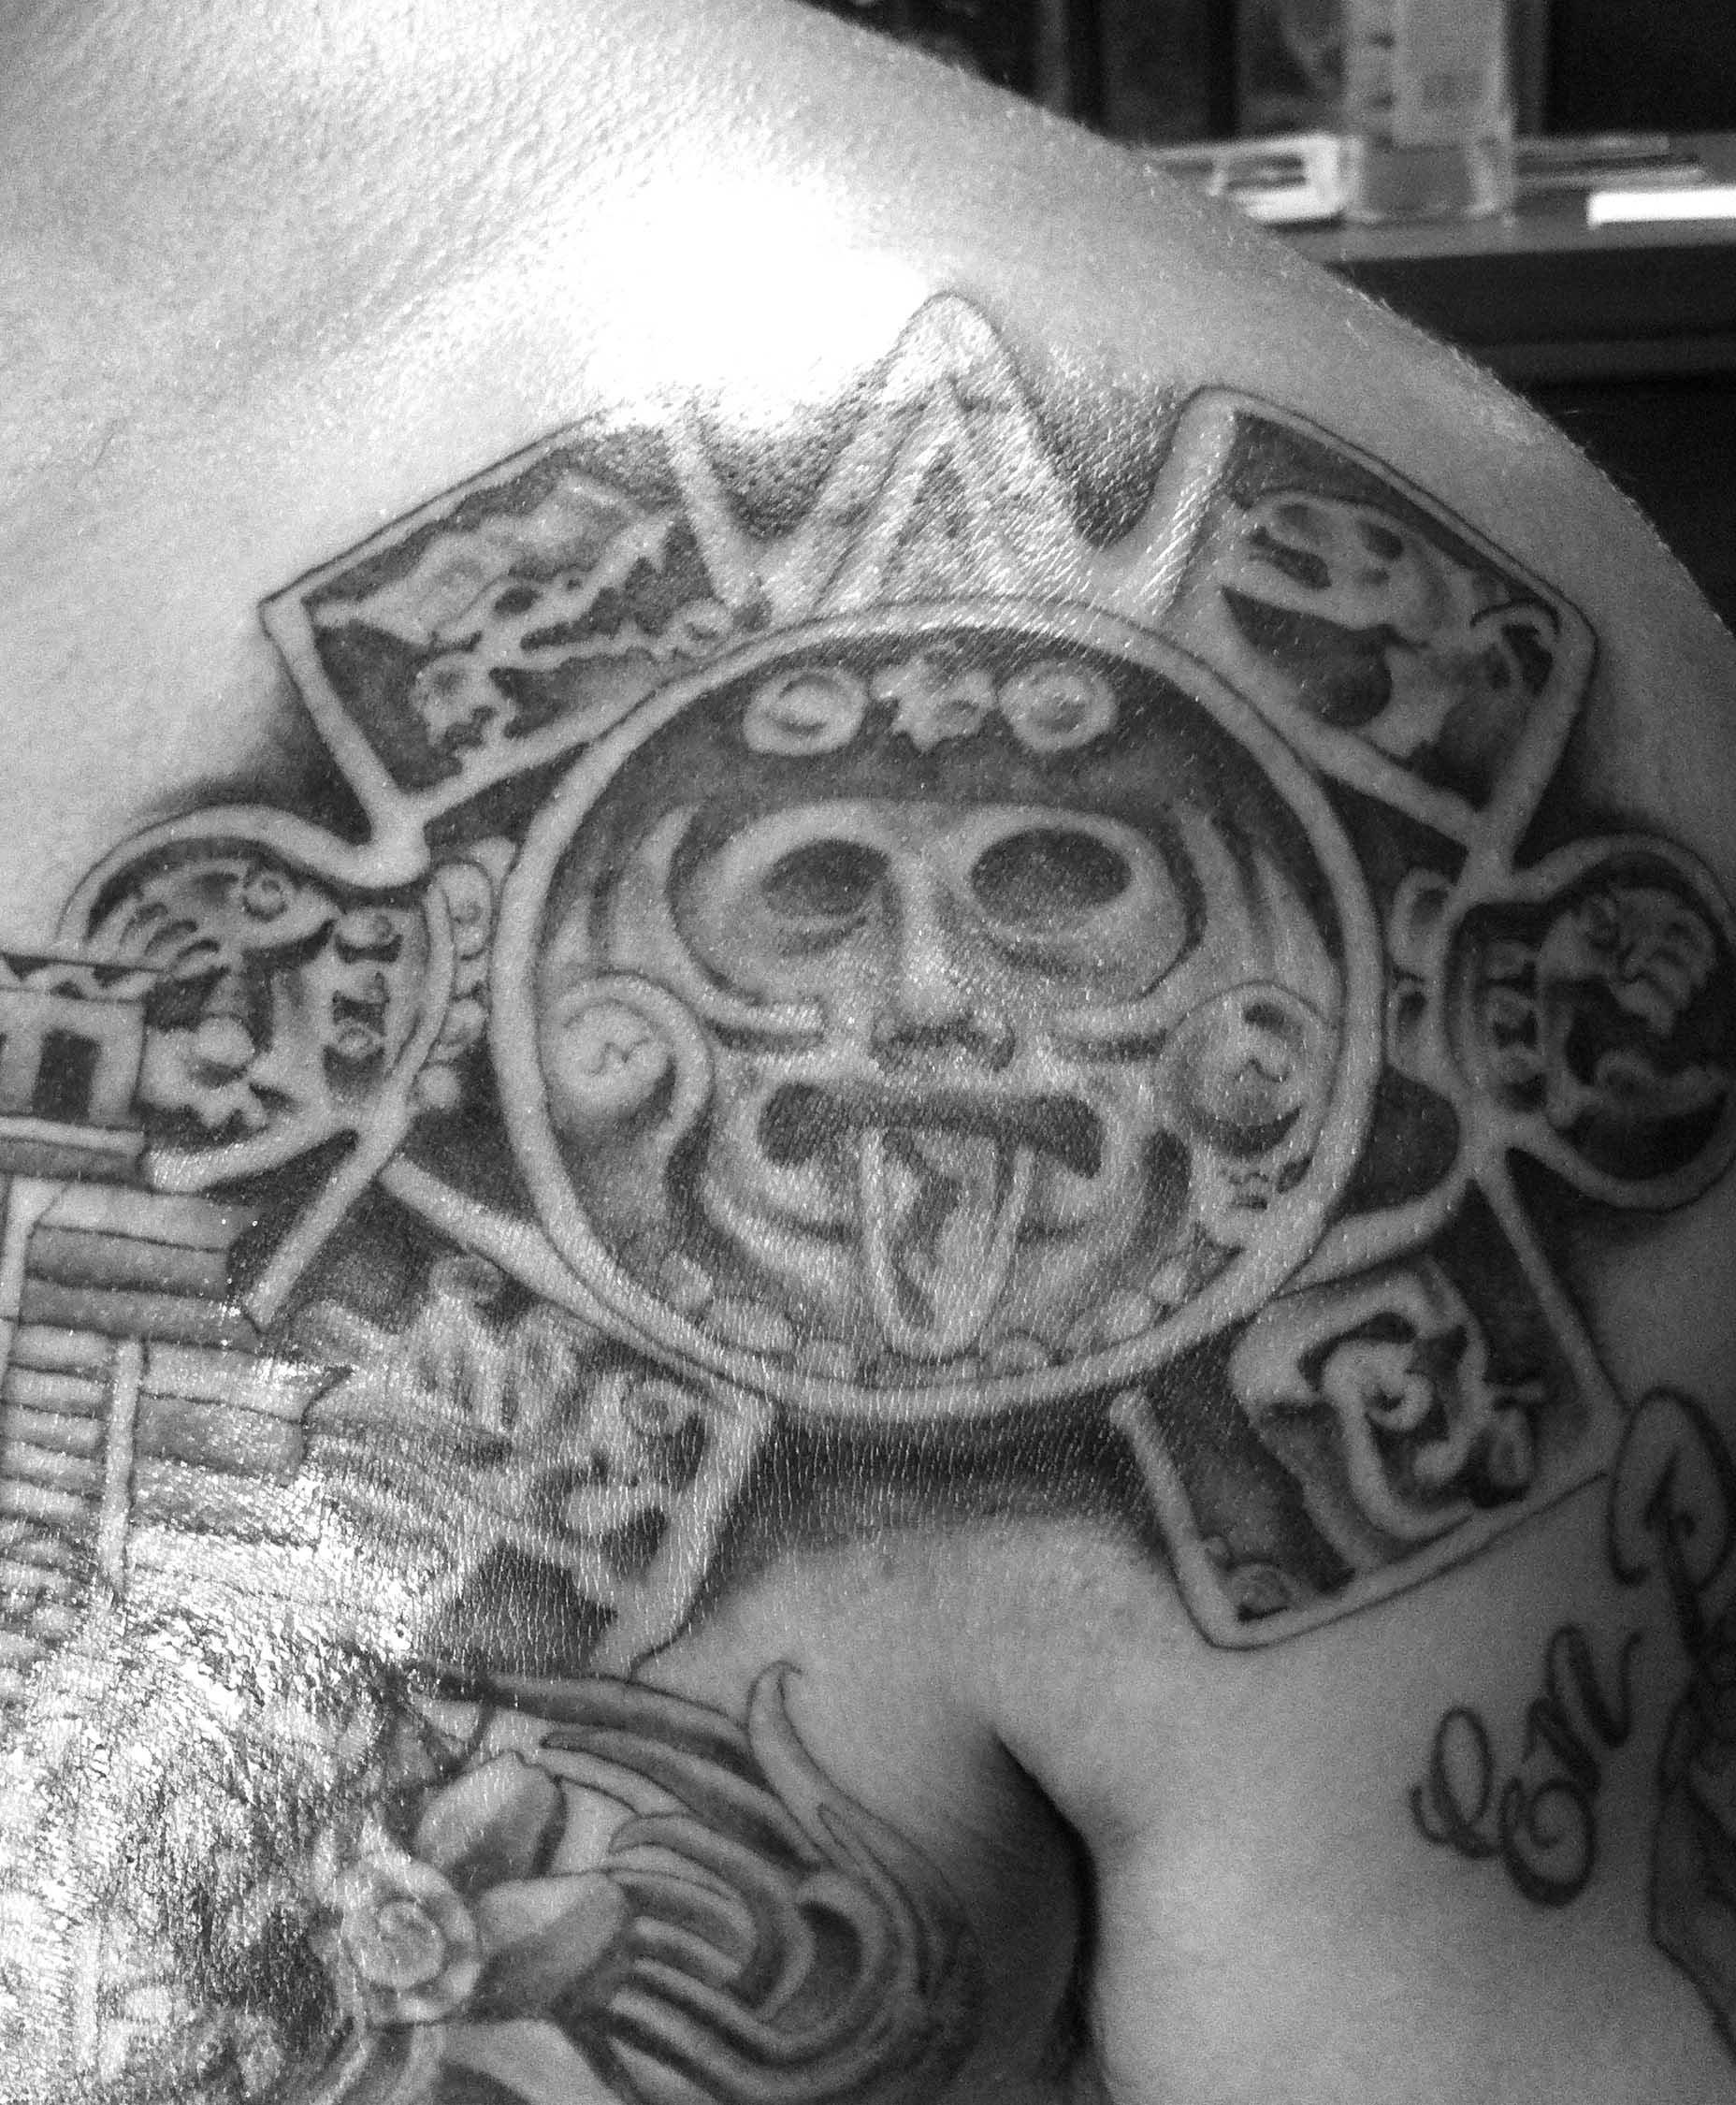 aztec art keep it gangsta lowrider artez aztec art